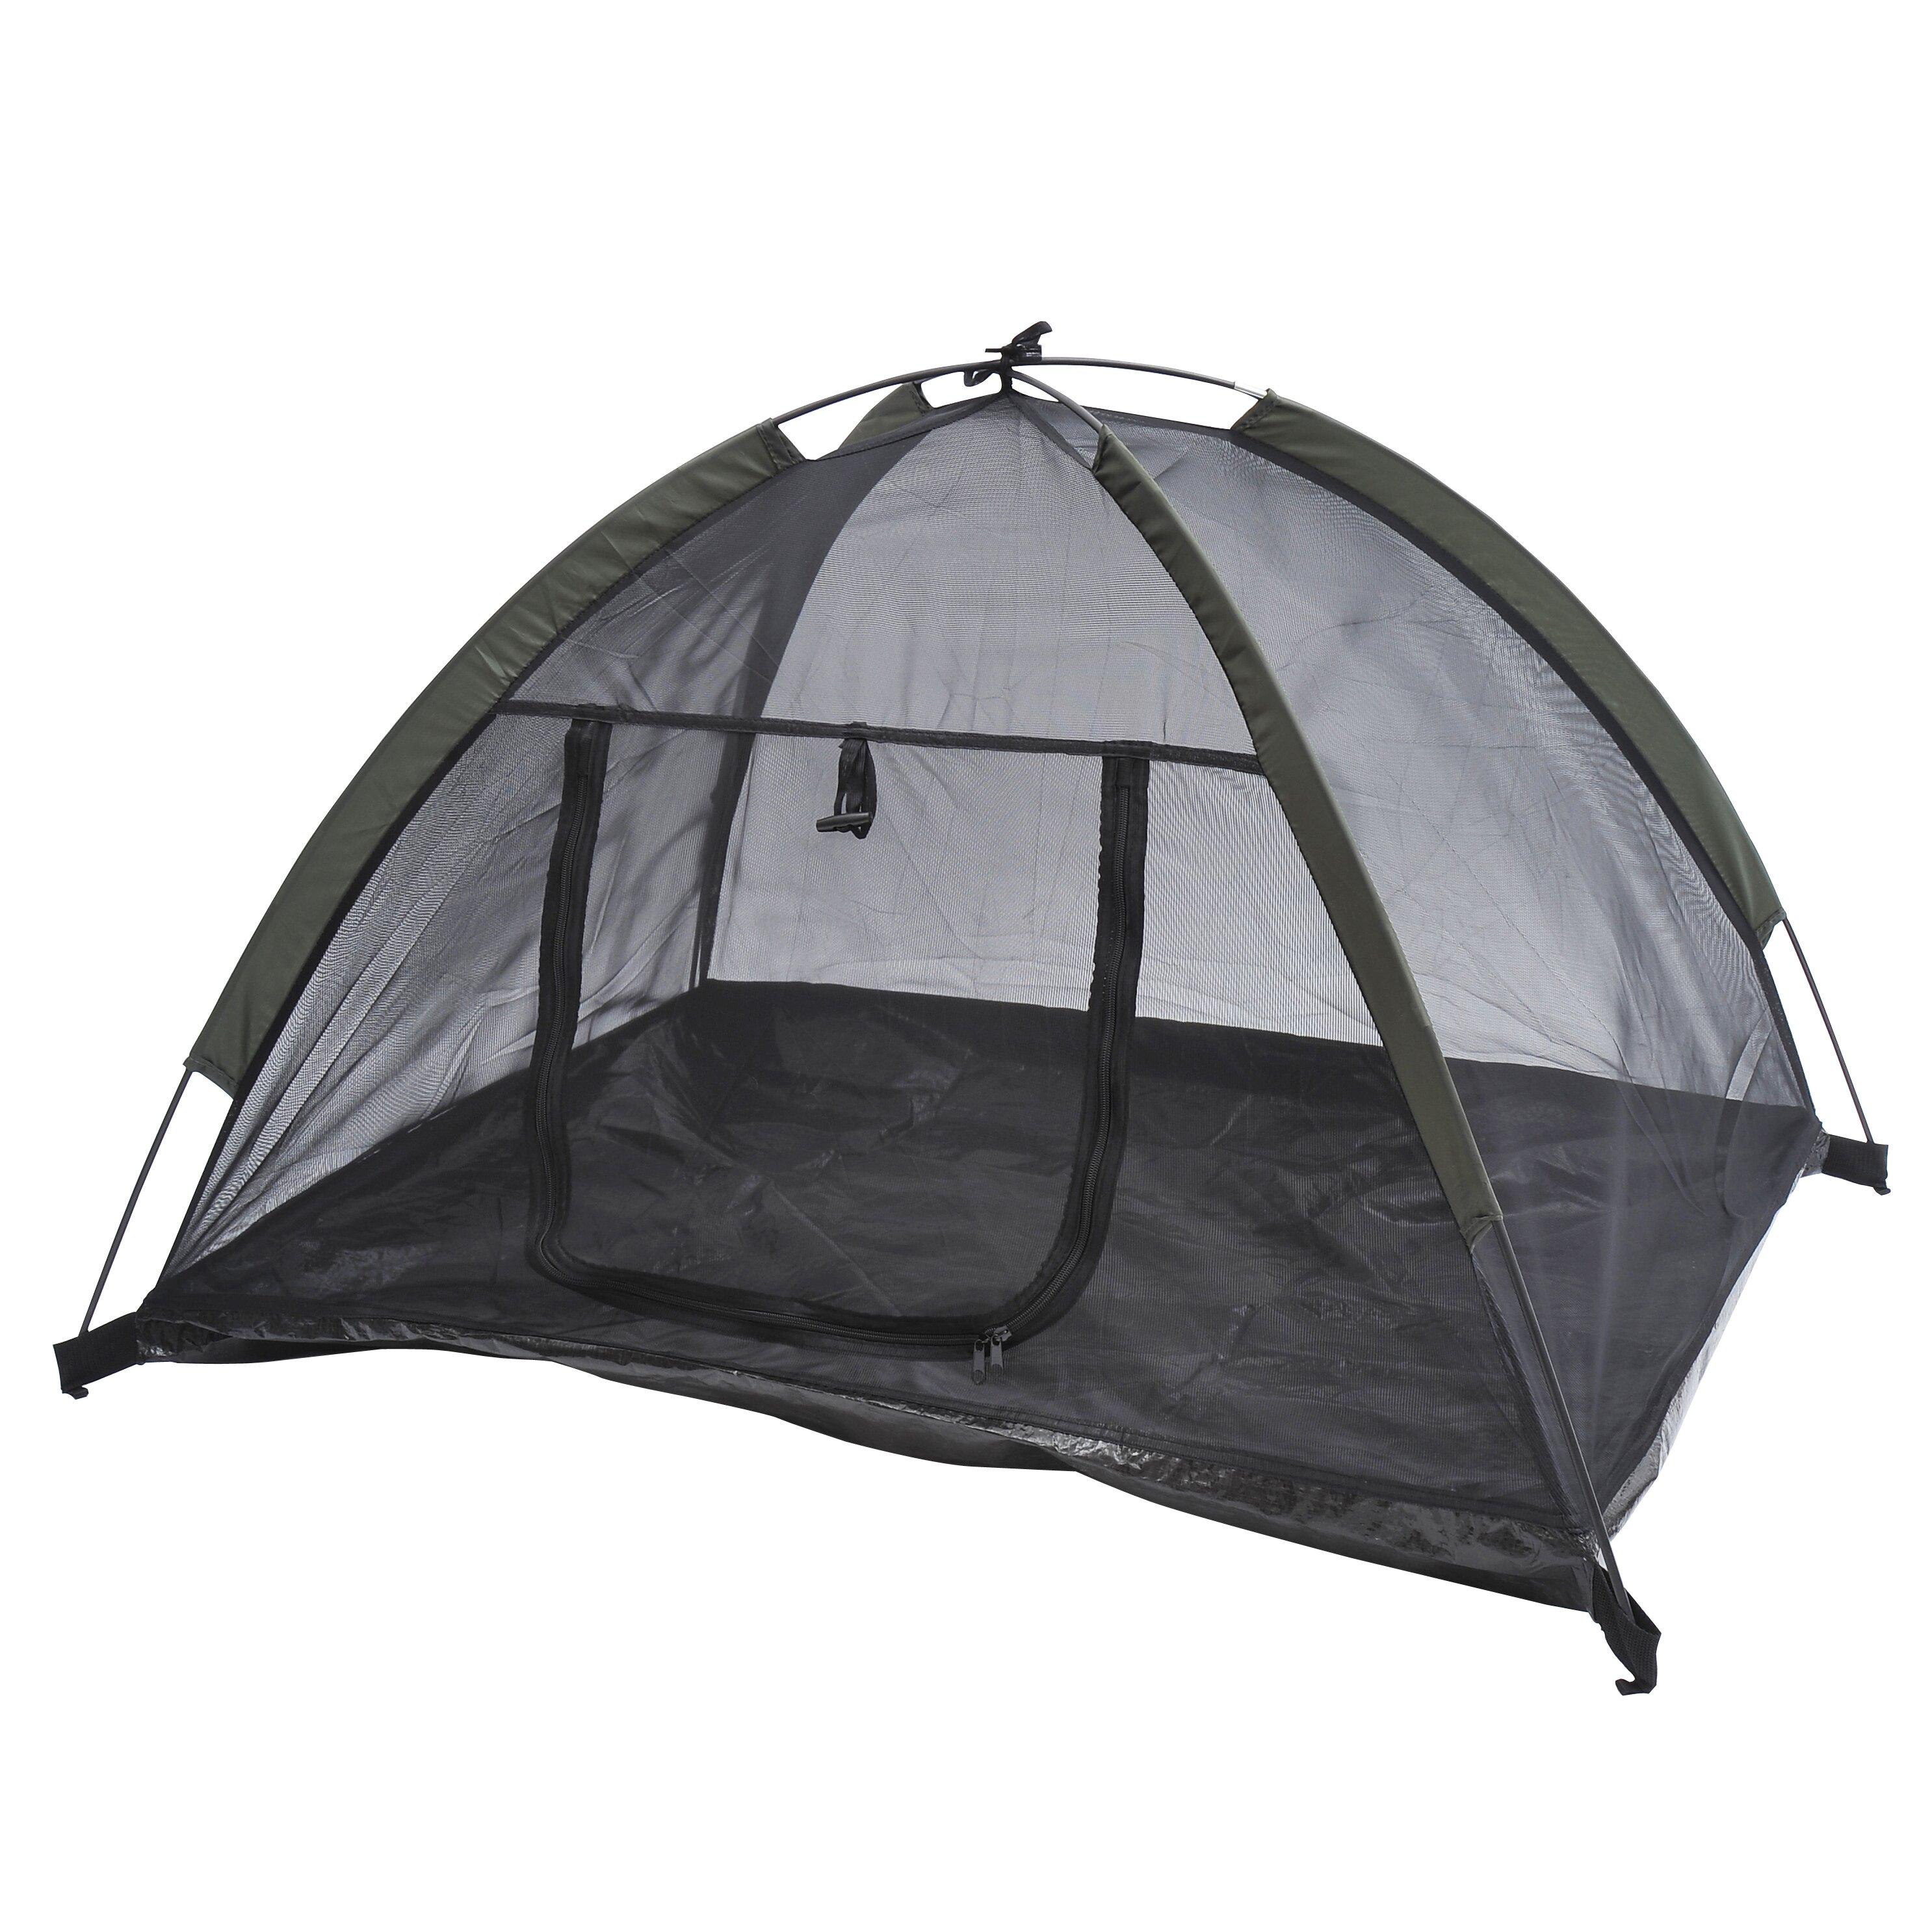 Pet Shelters Pop Up : Mdog outdoor mesh pet camping tent reviews wayfair